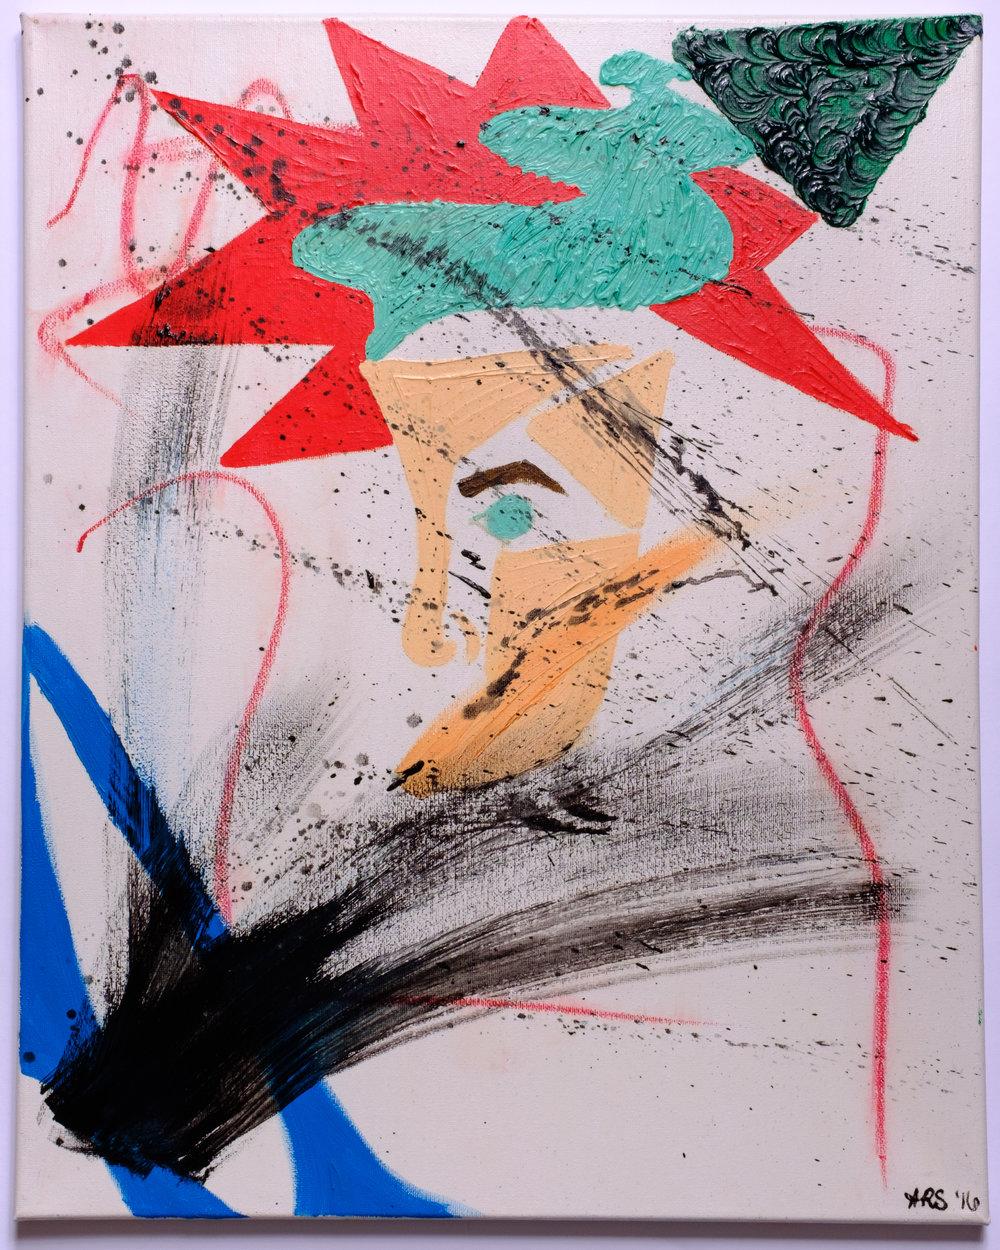 Untitled No.51